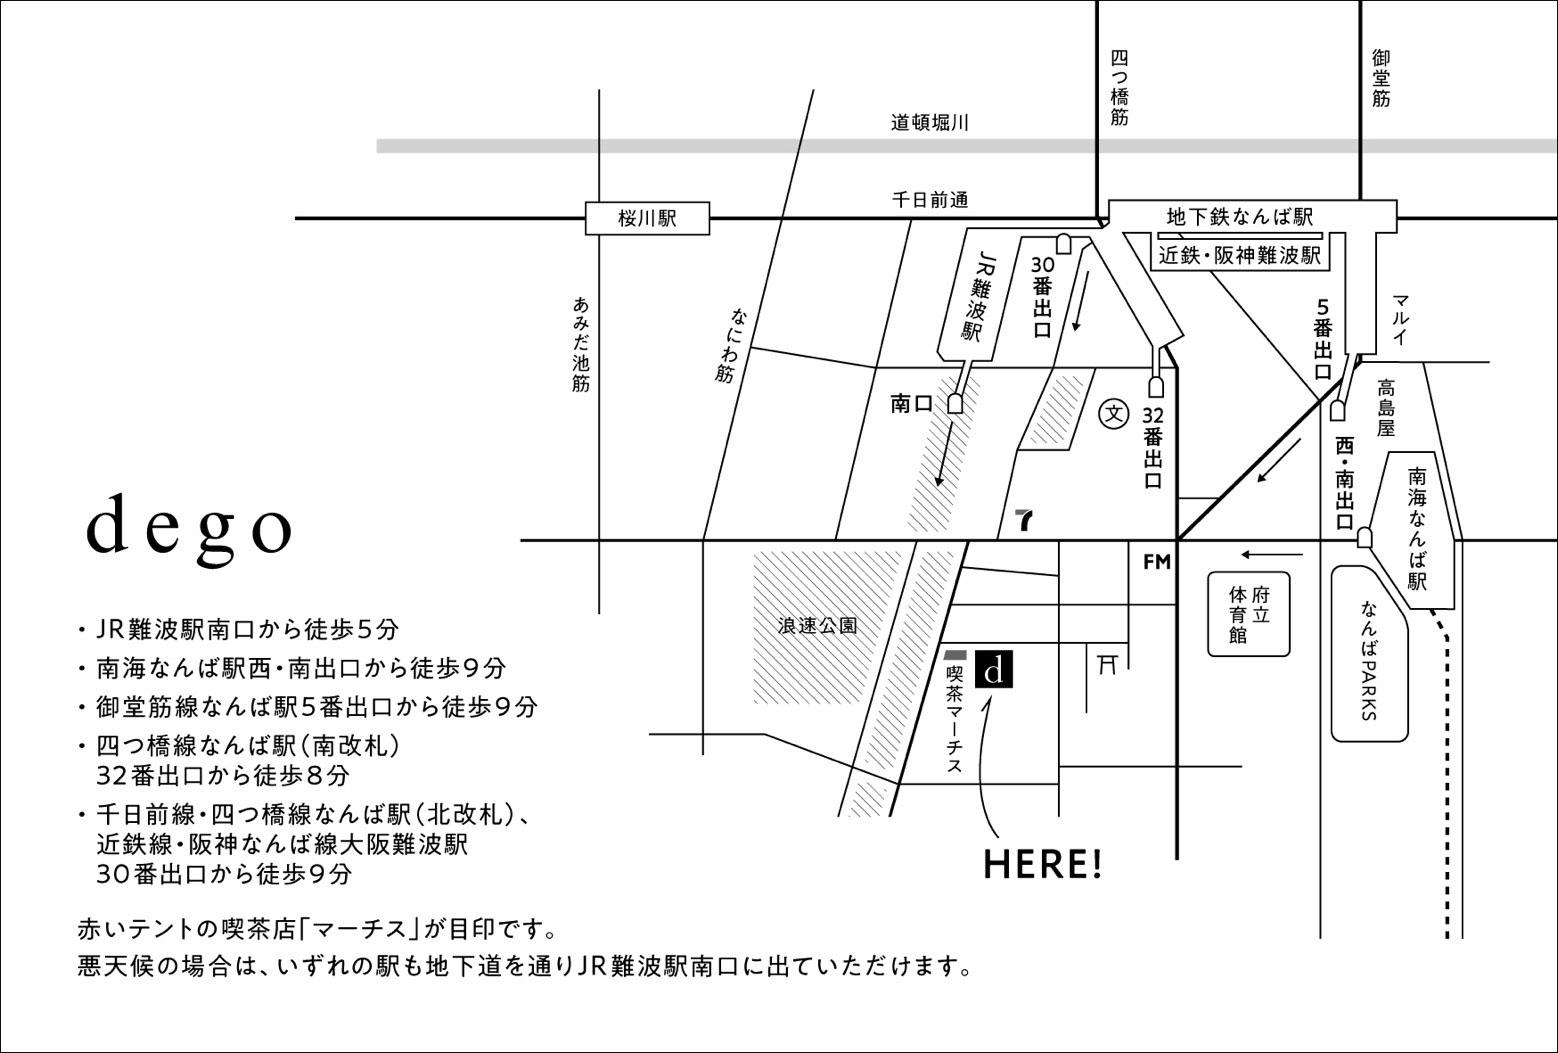 dego_map_2020